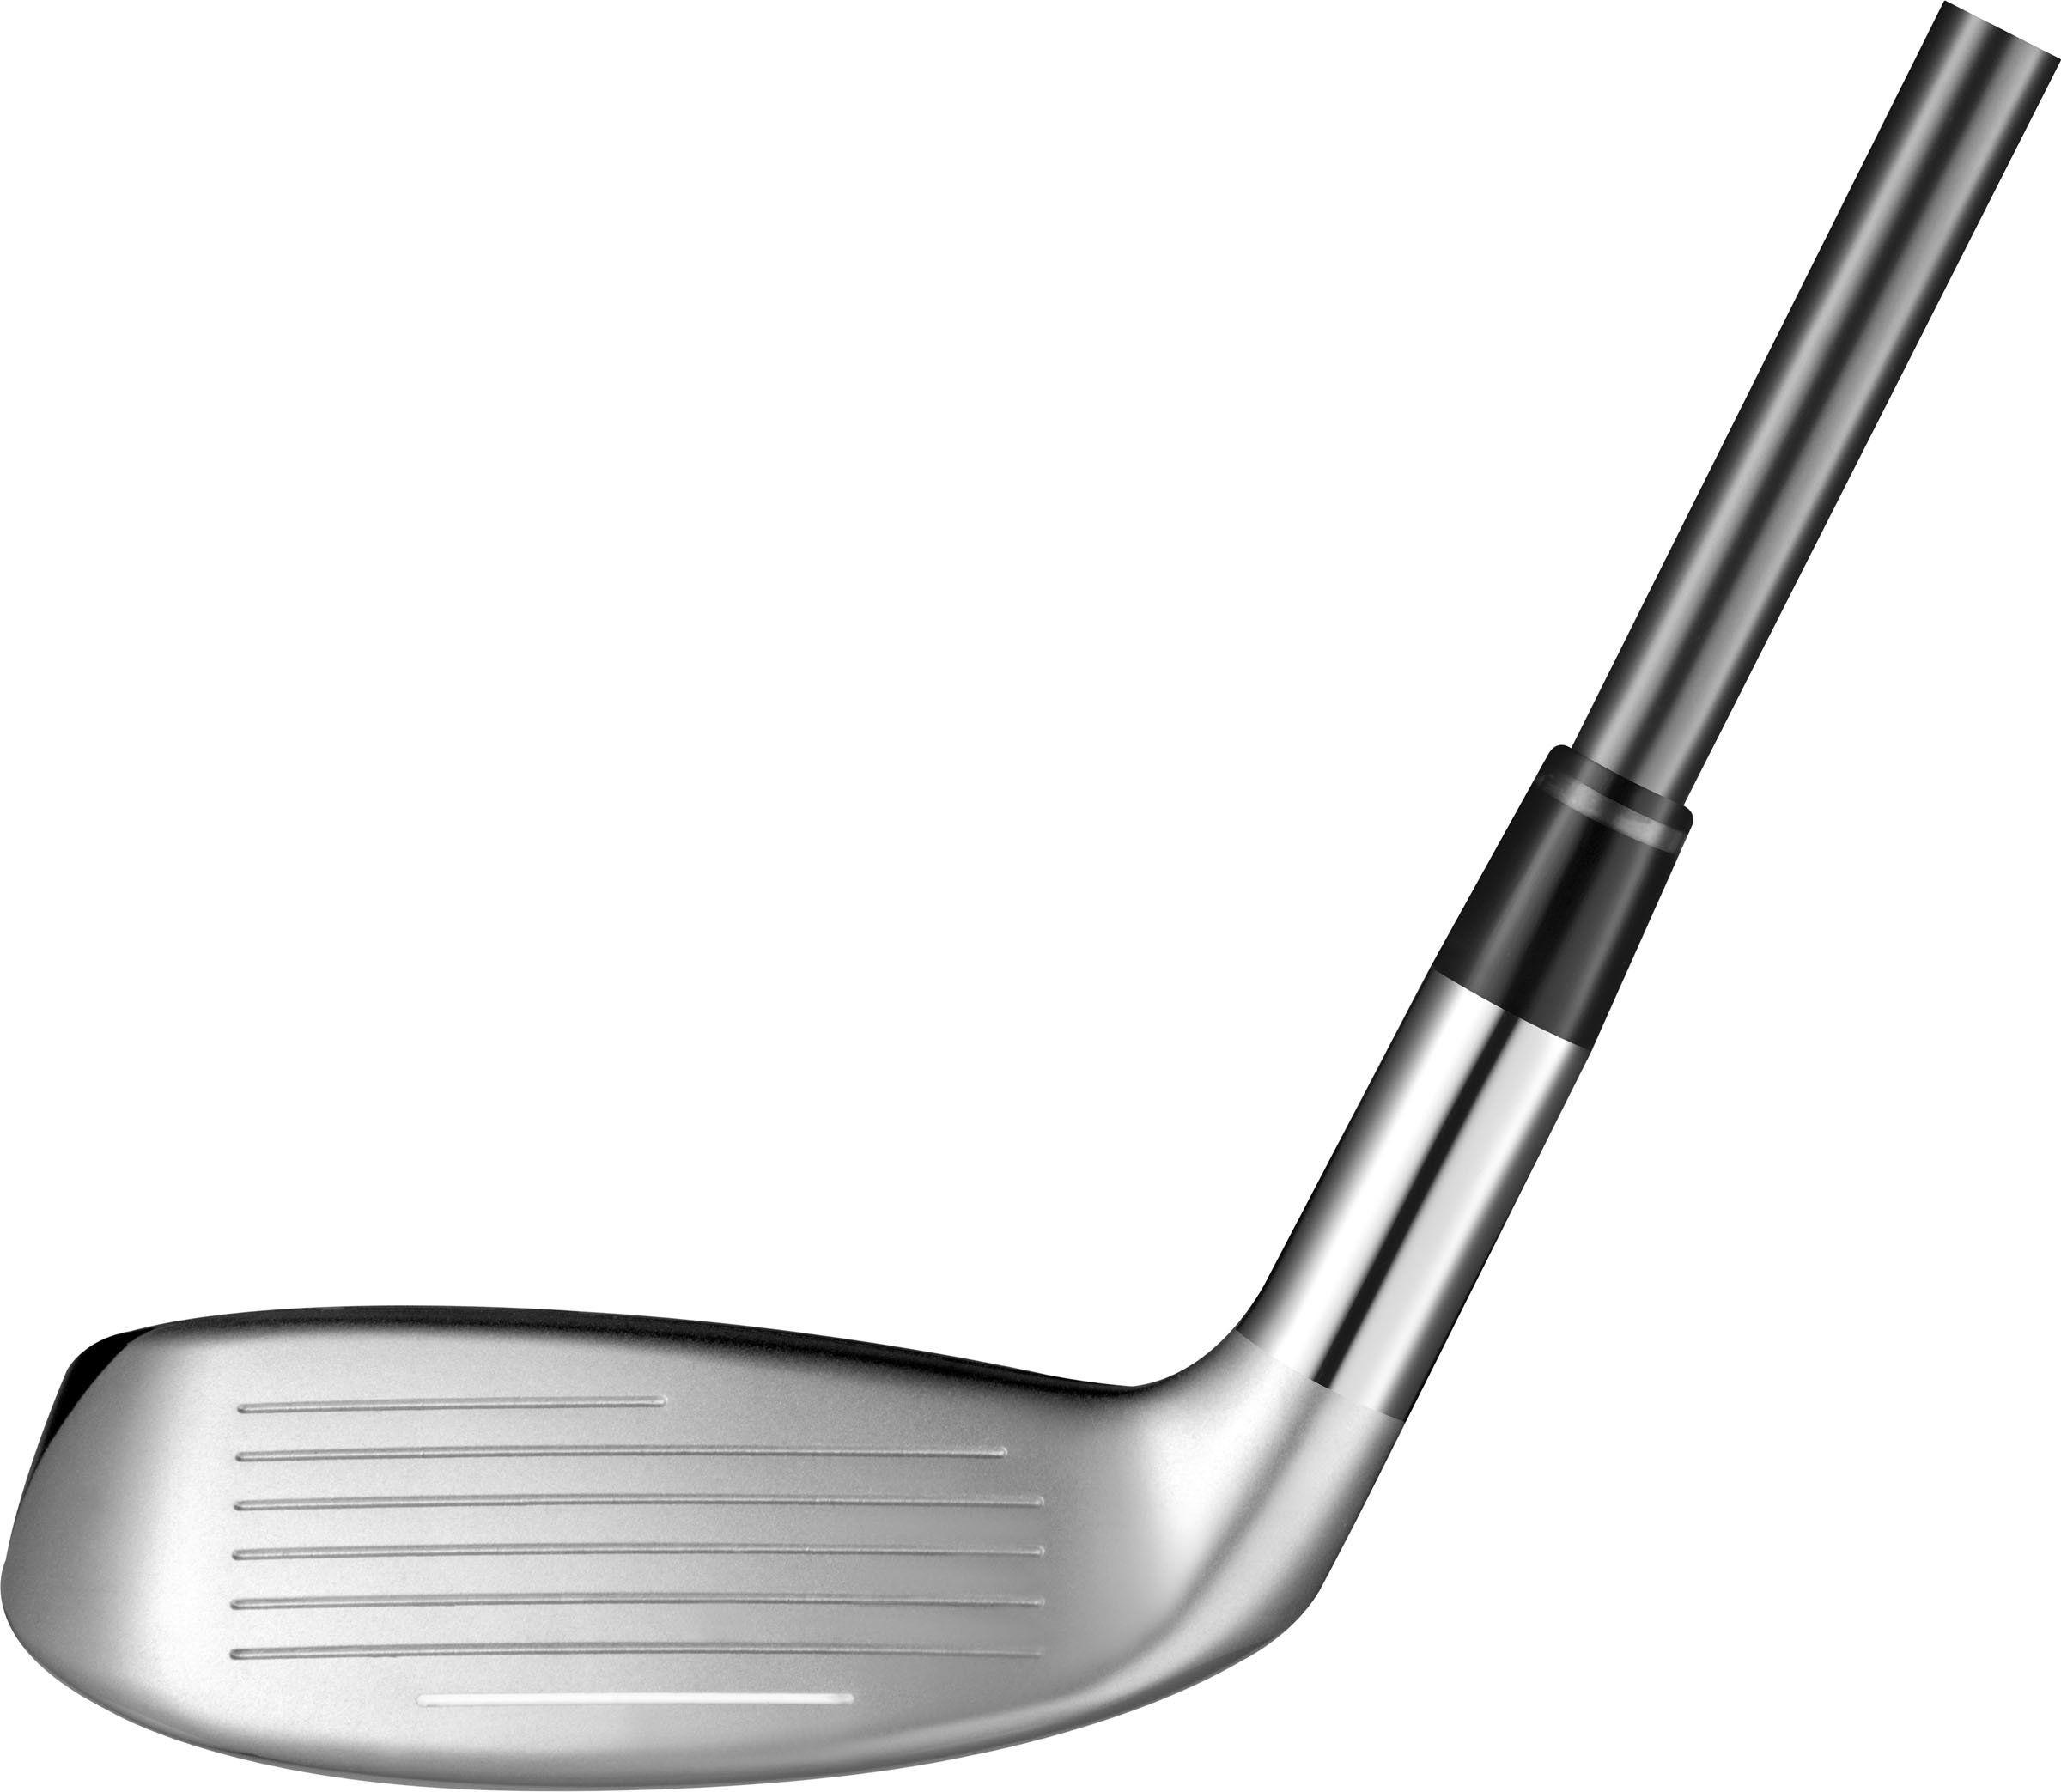 25+ Adams golf hybrid 7 iron ideas in 2021